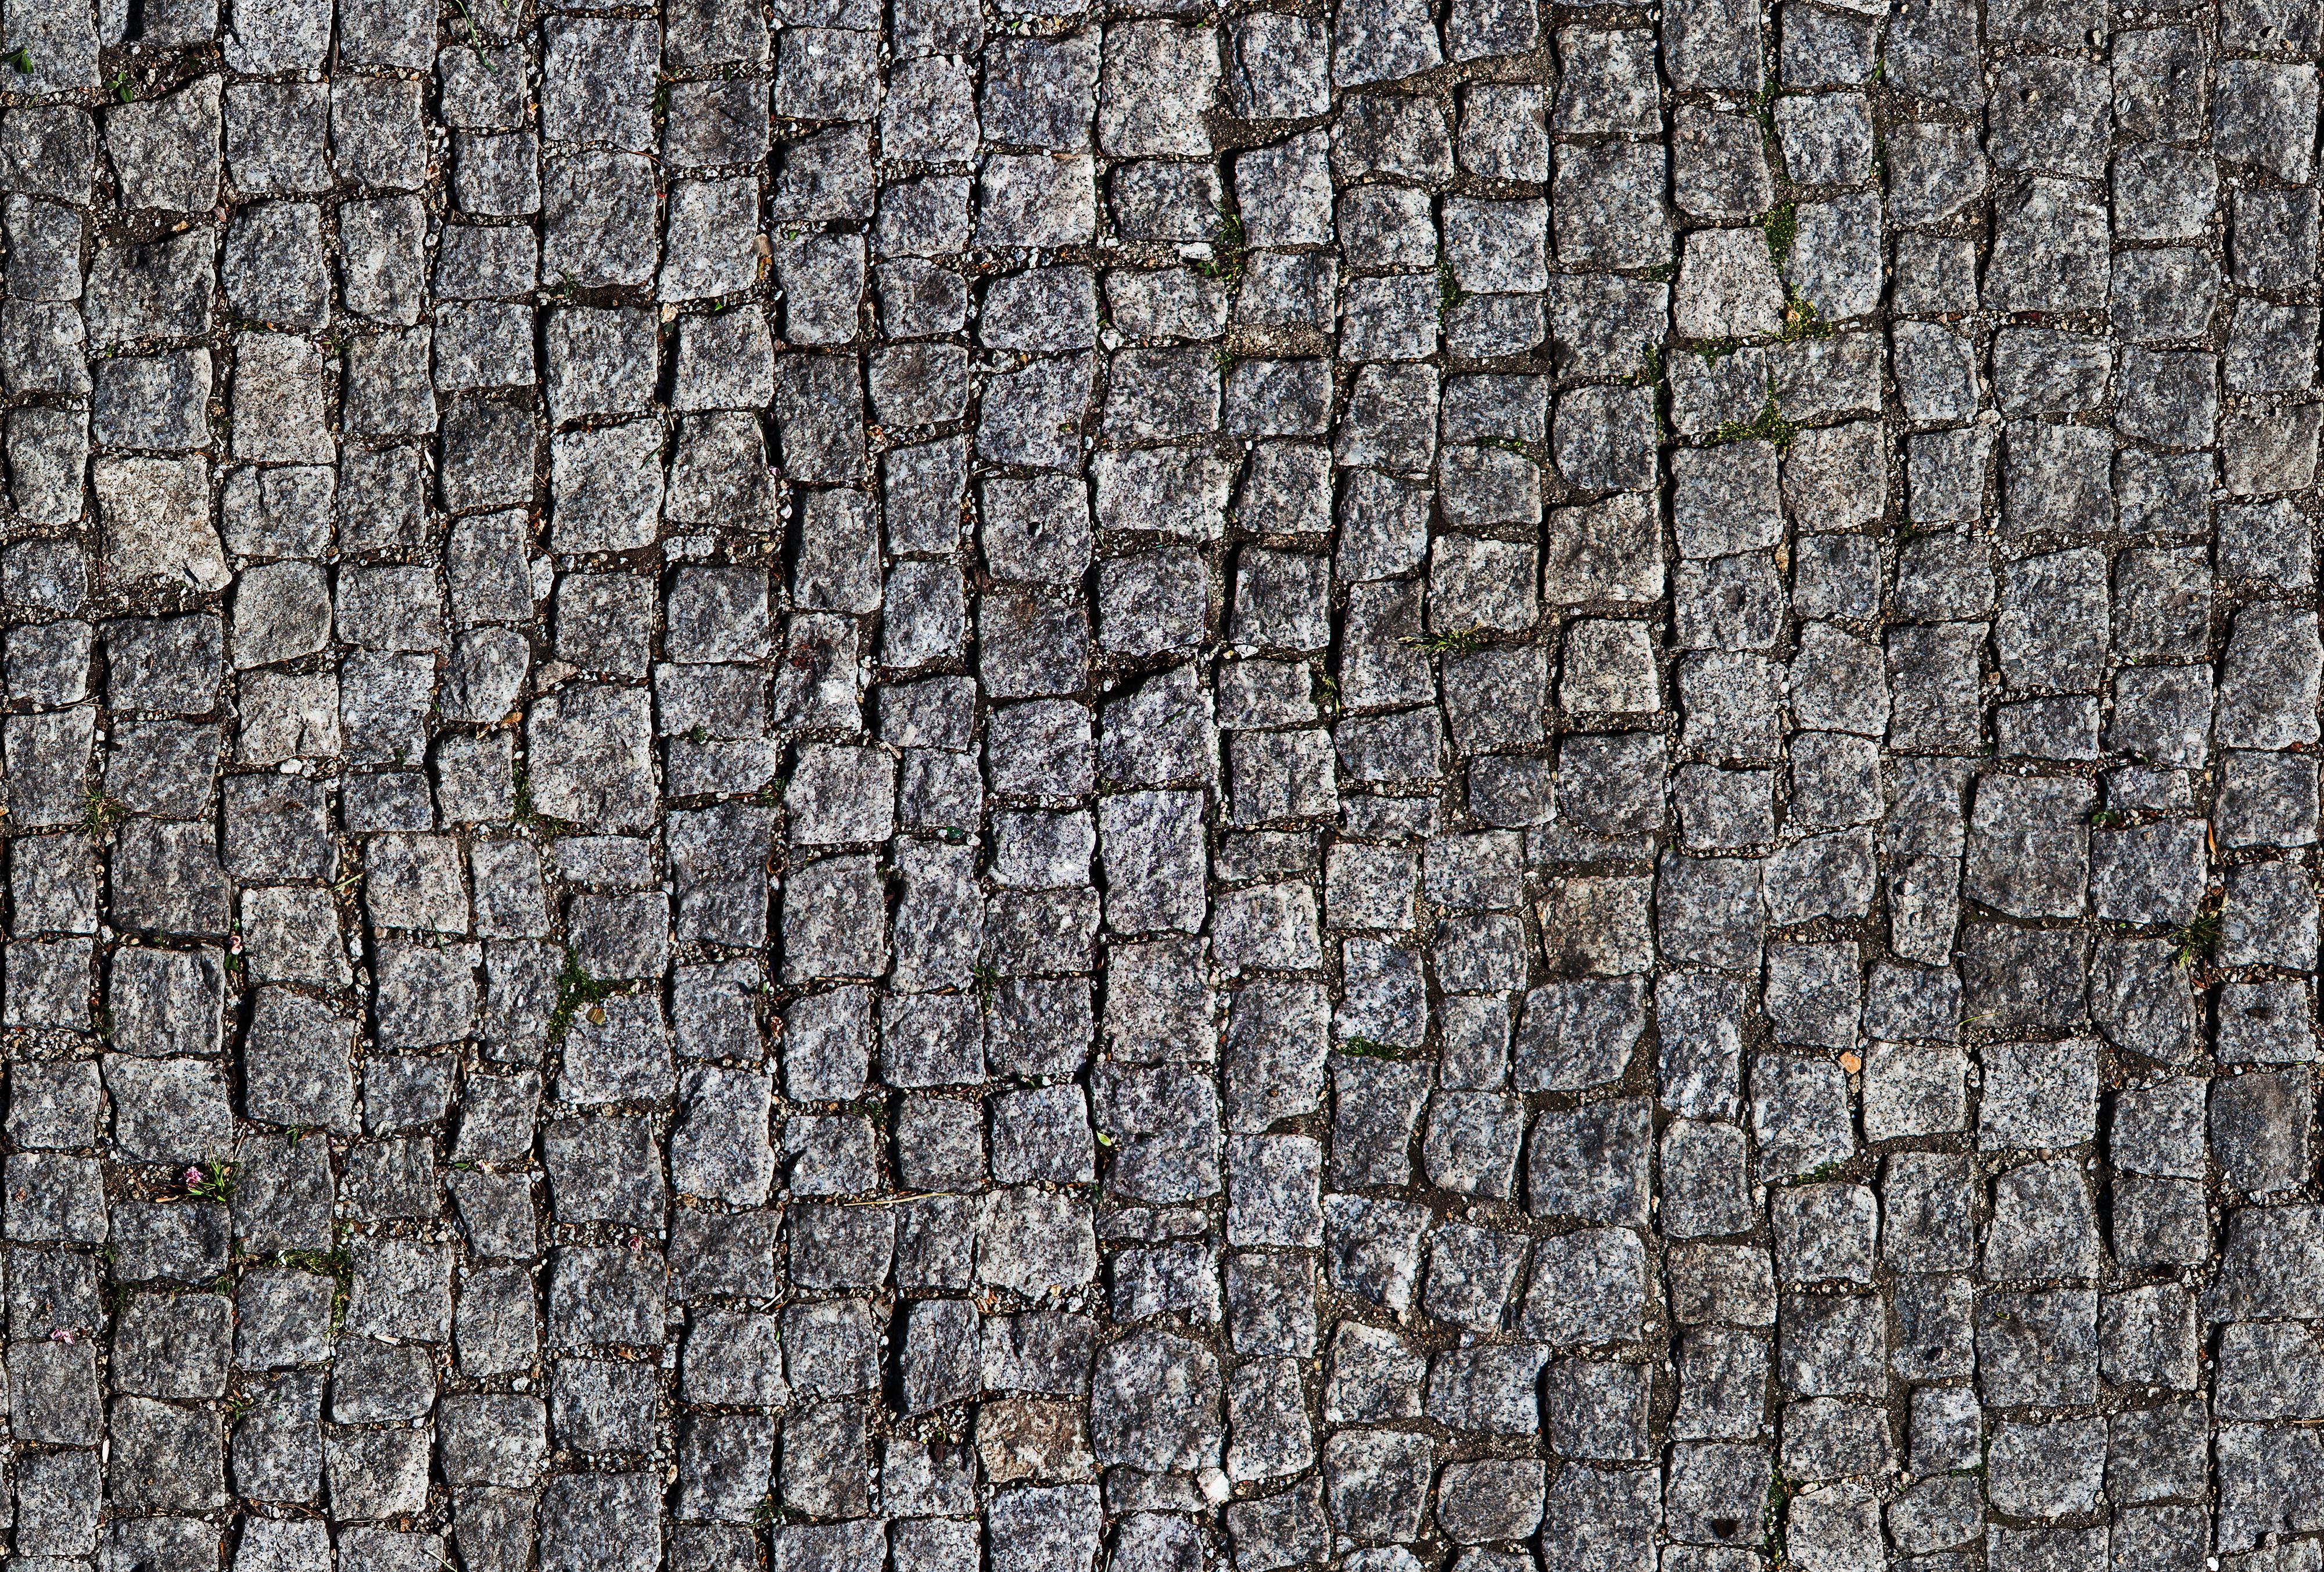 Seamless Granite Pavement Texture Wild Textures